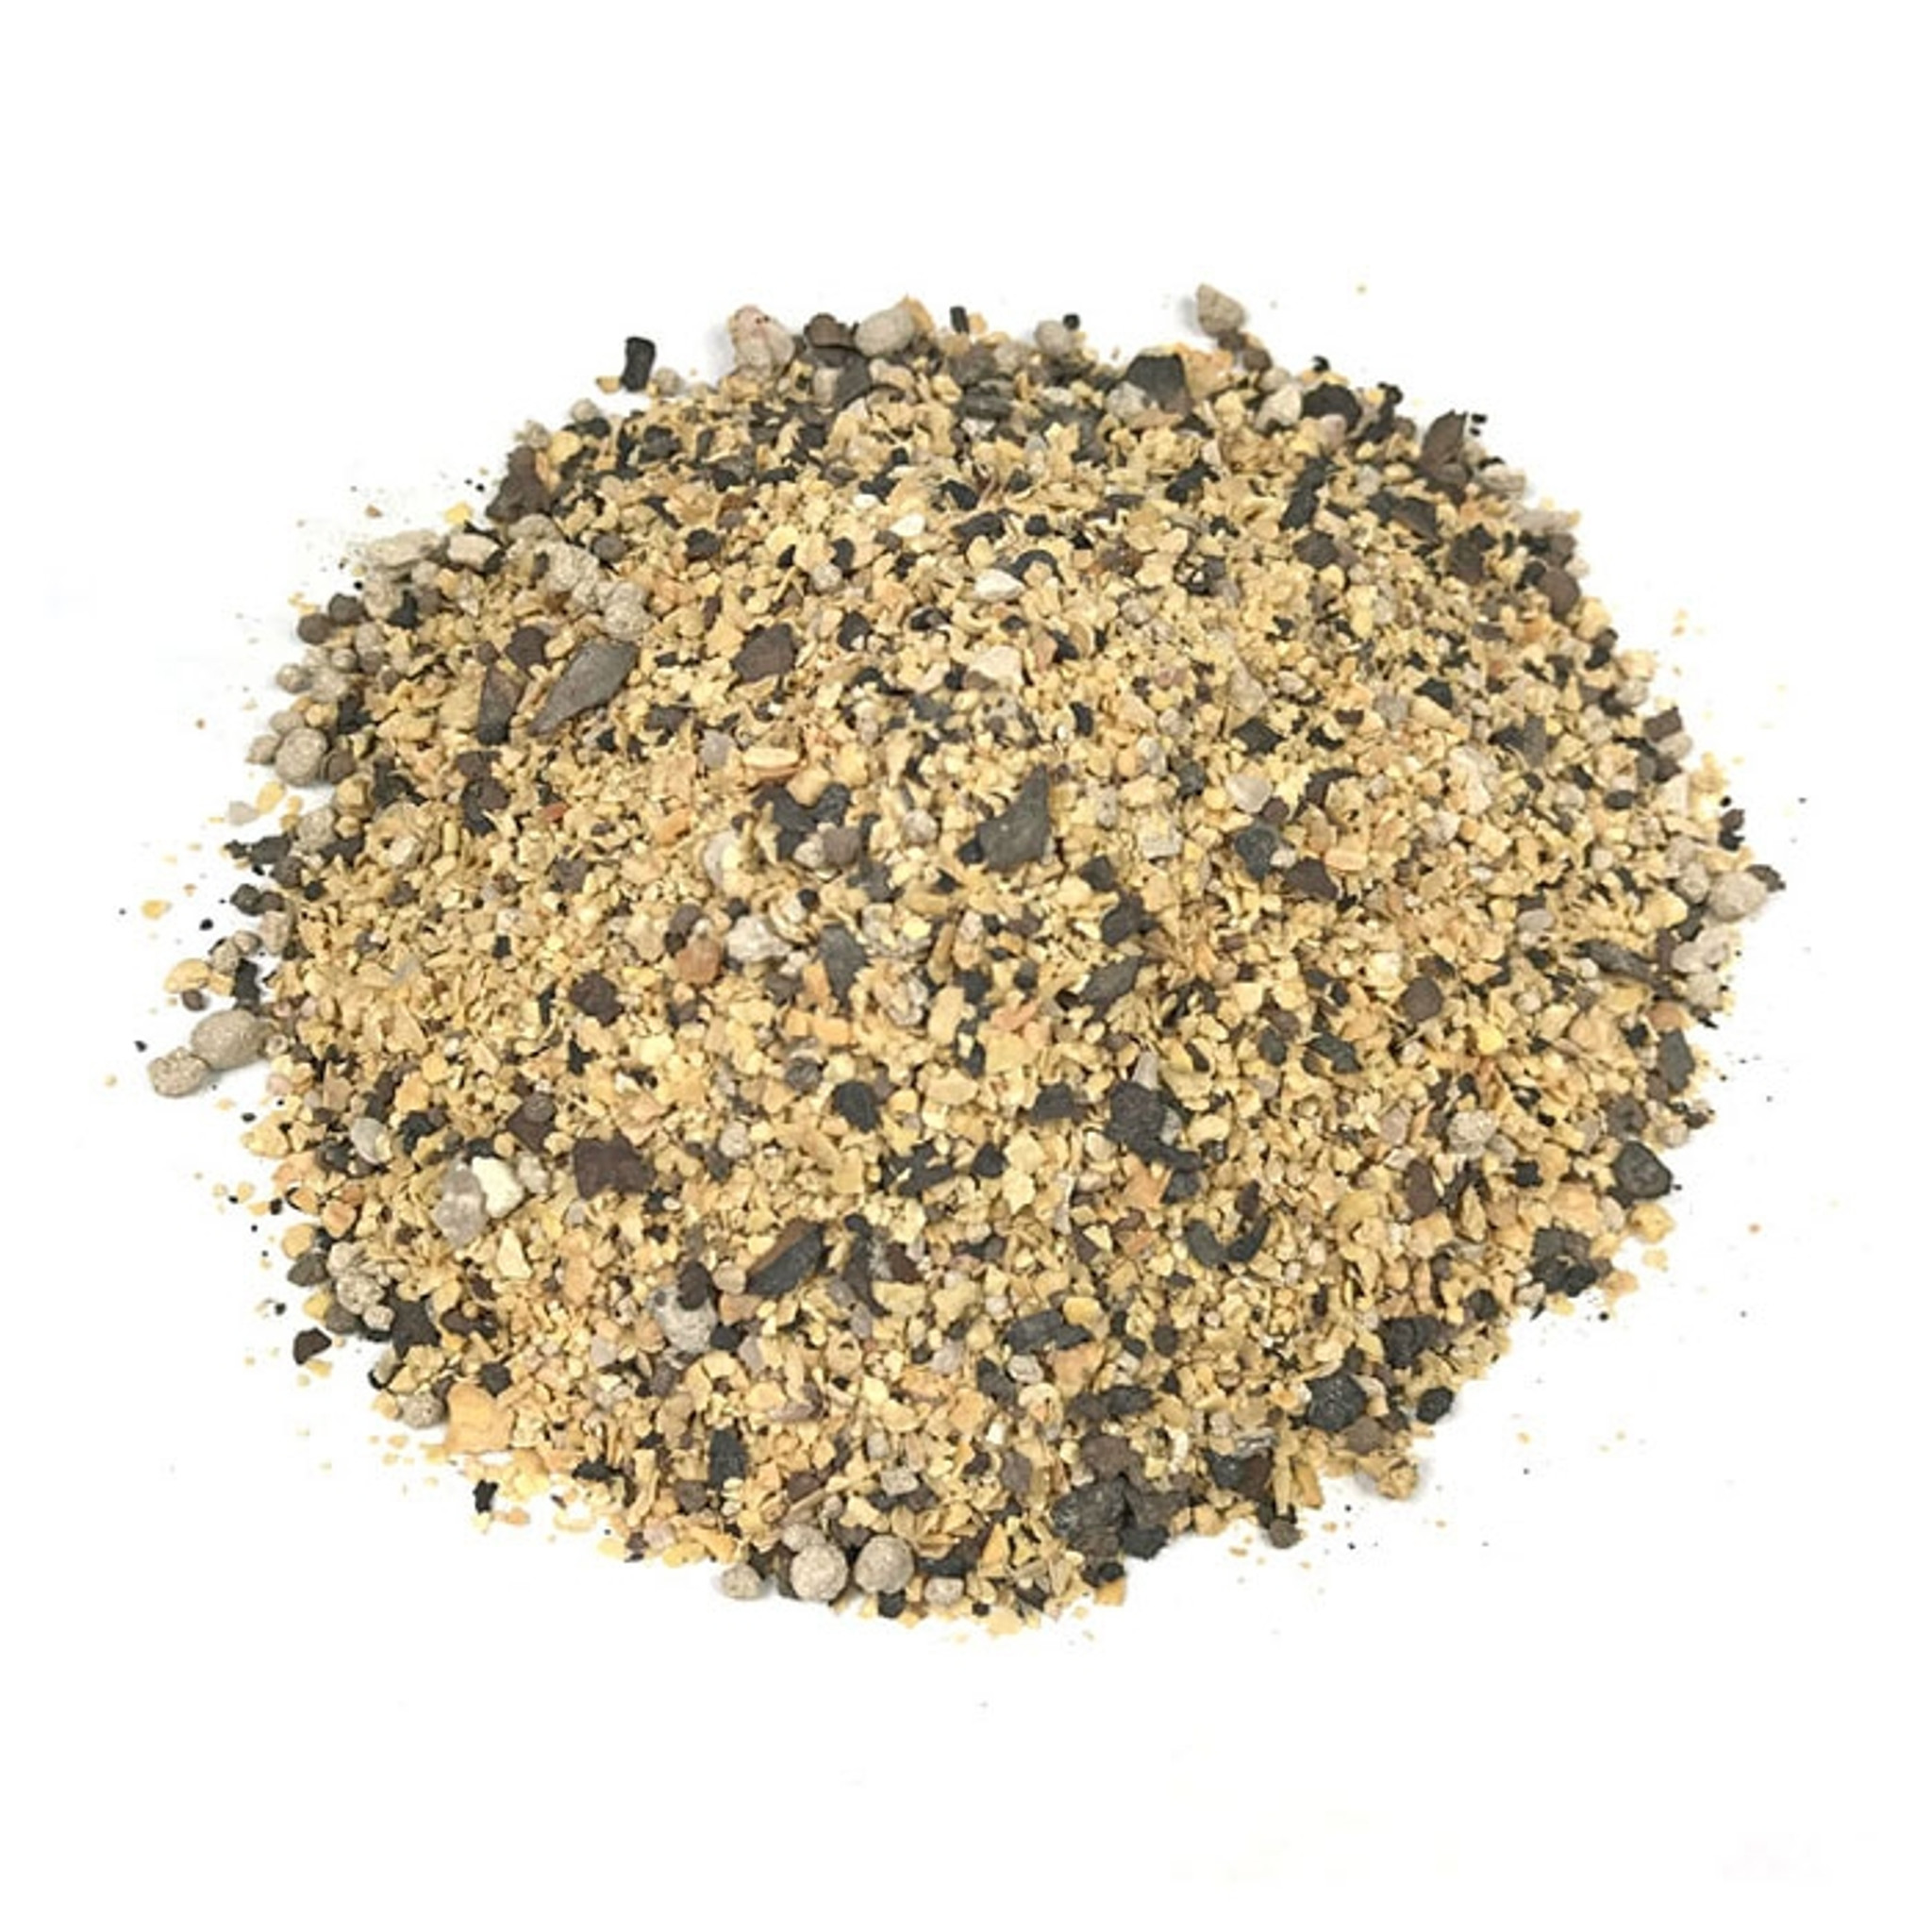 All-Purpose Organic Fertilizer 5-3-4